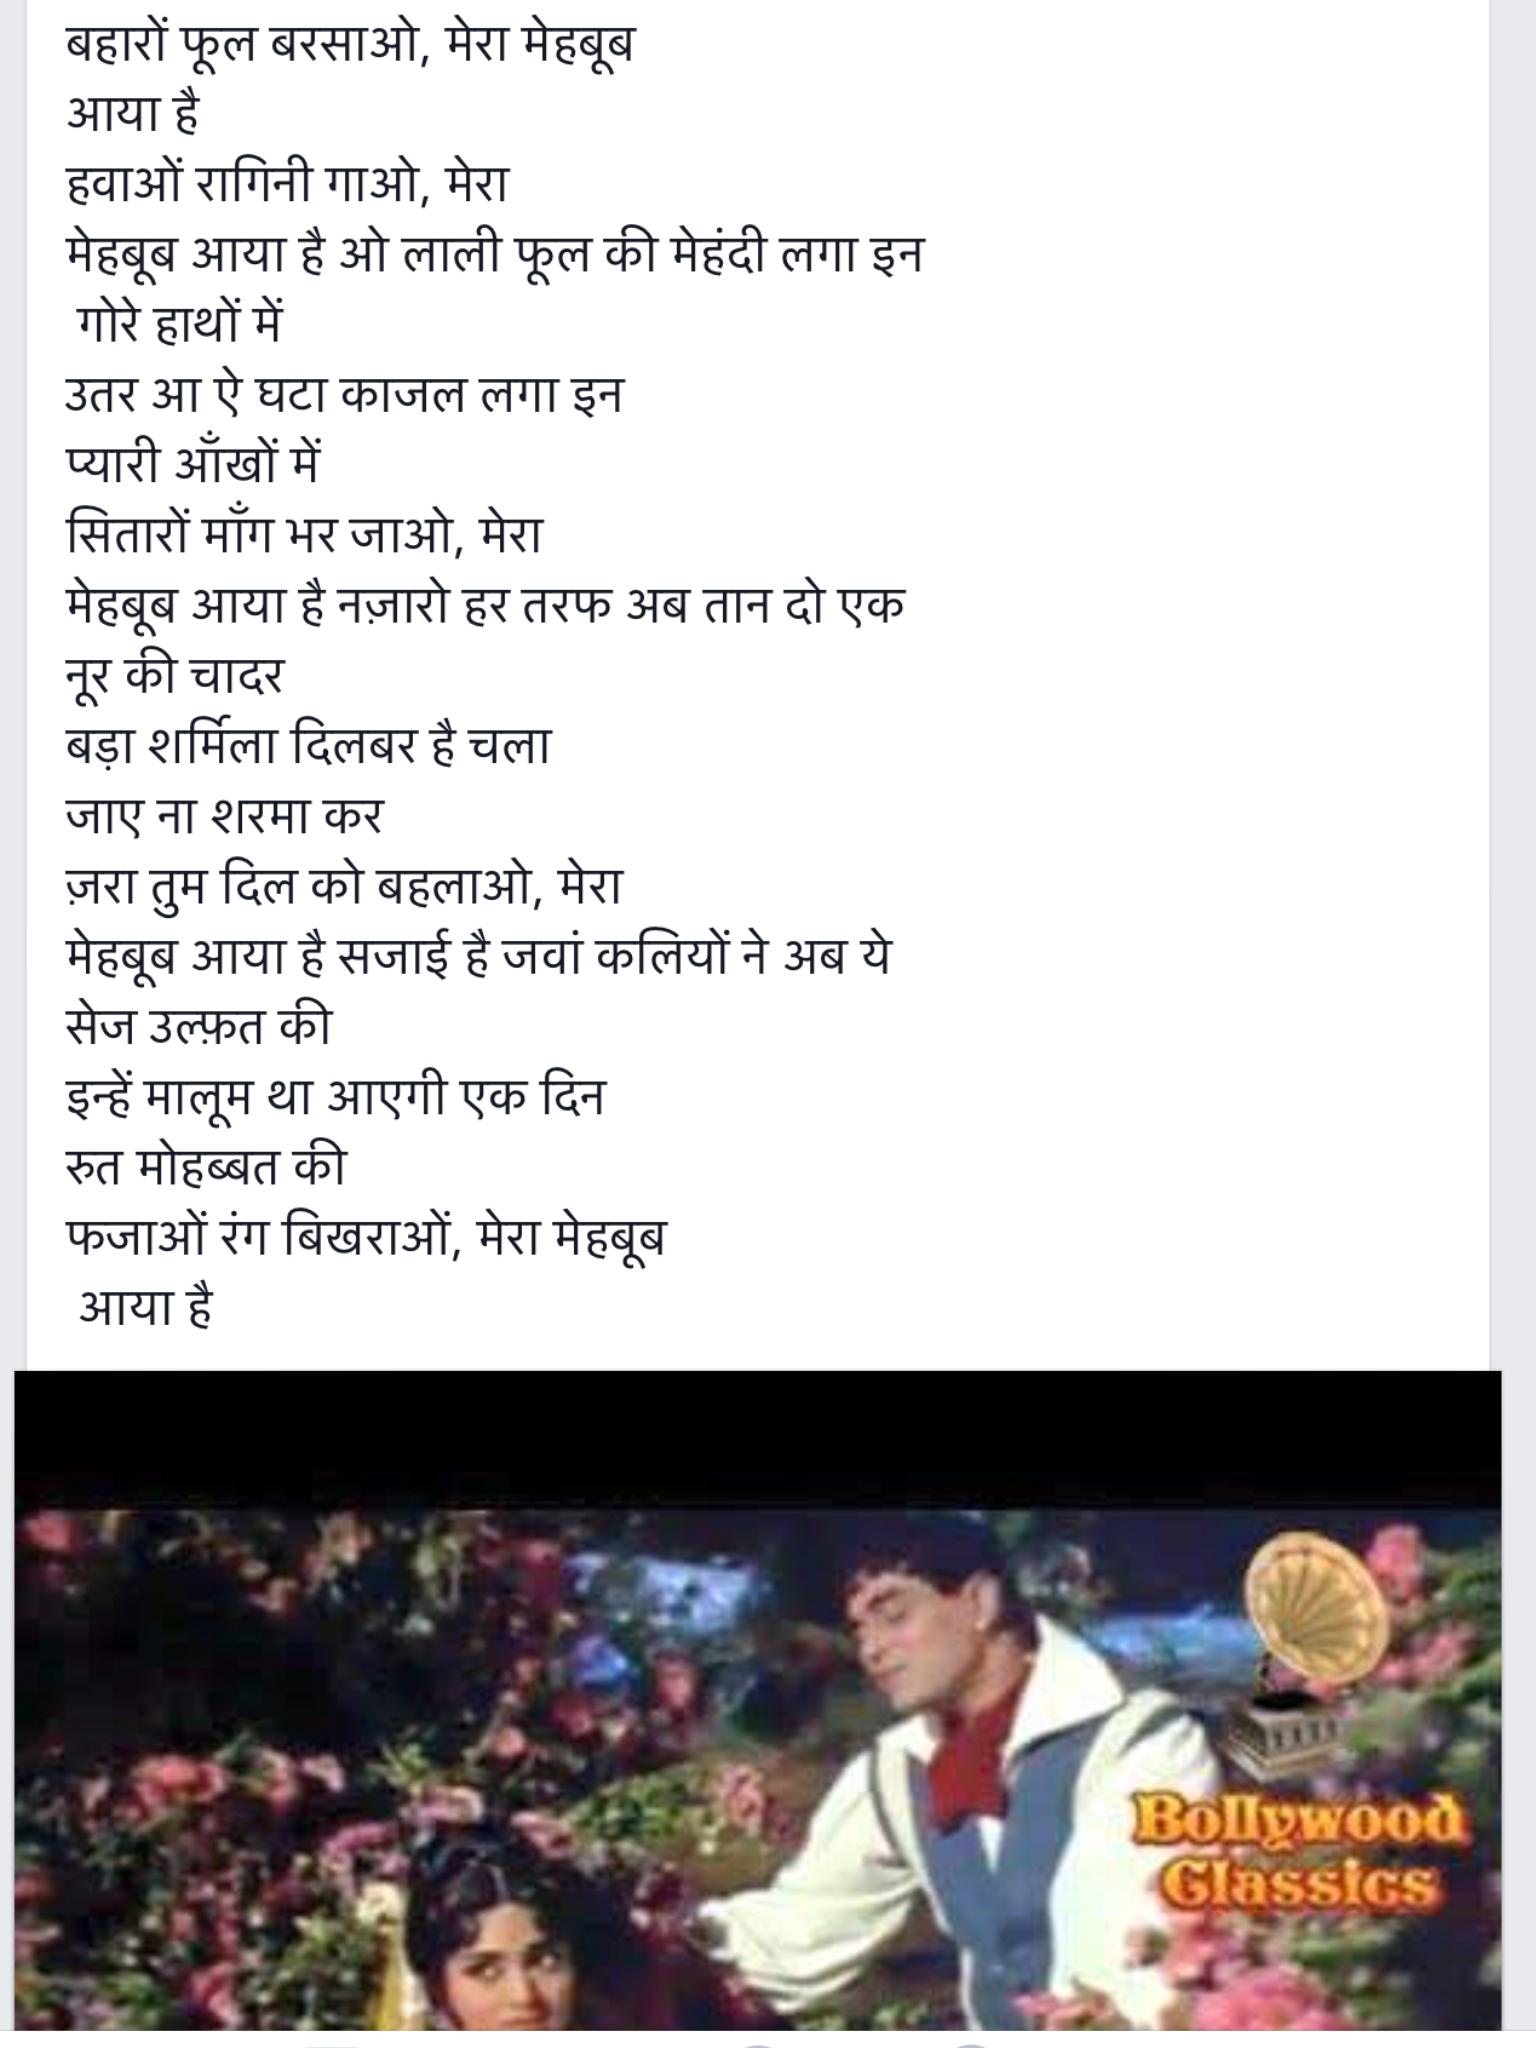 Pin By Kalyani Dar On Songs Gazal Romantic Song Lyrics Love Songs Lyrics Old Song Lyrics Read the best jokes in hindi, funny hindi chutkule, funny hindi jokes, funny sms jokes in hindi & many more at navbharat times. pinterest